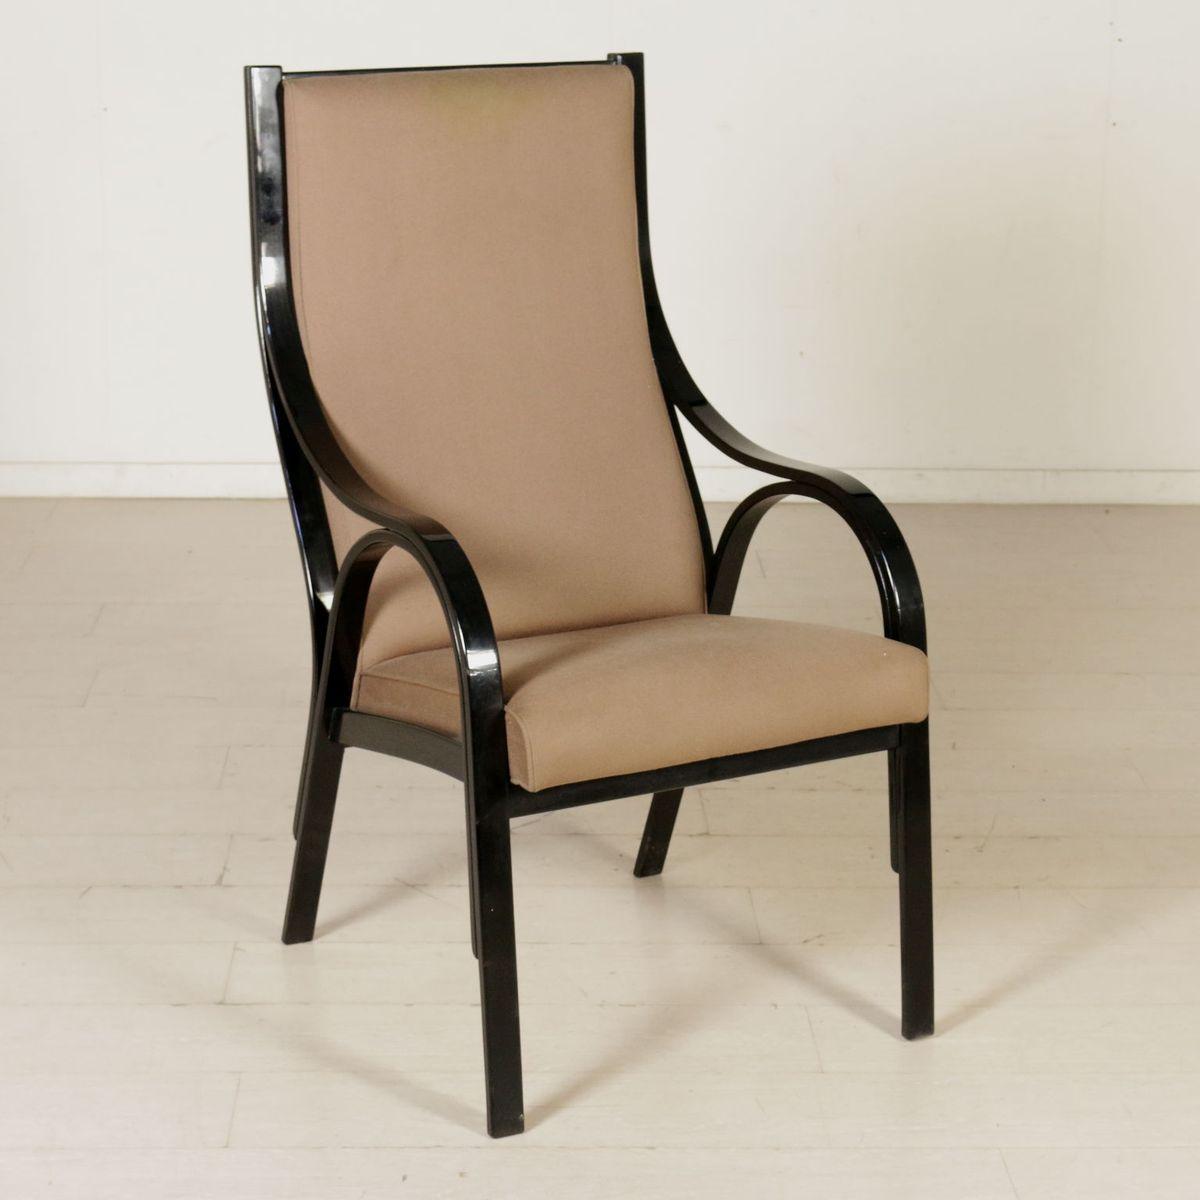 italienische cavour armlehnst hle von stoppino meneghetti gregotti f r sim 1980er 2er set. Black Bedroom Furniture Sets. Home Design Ideas